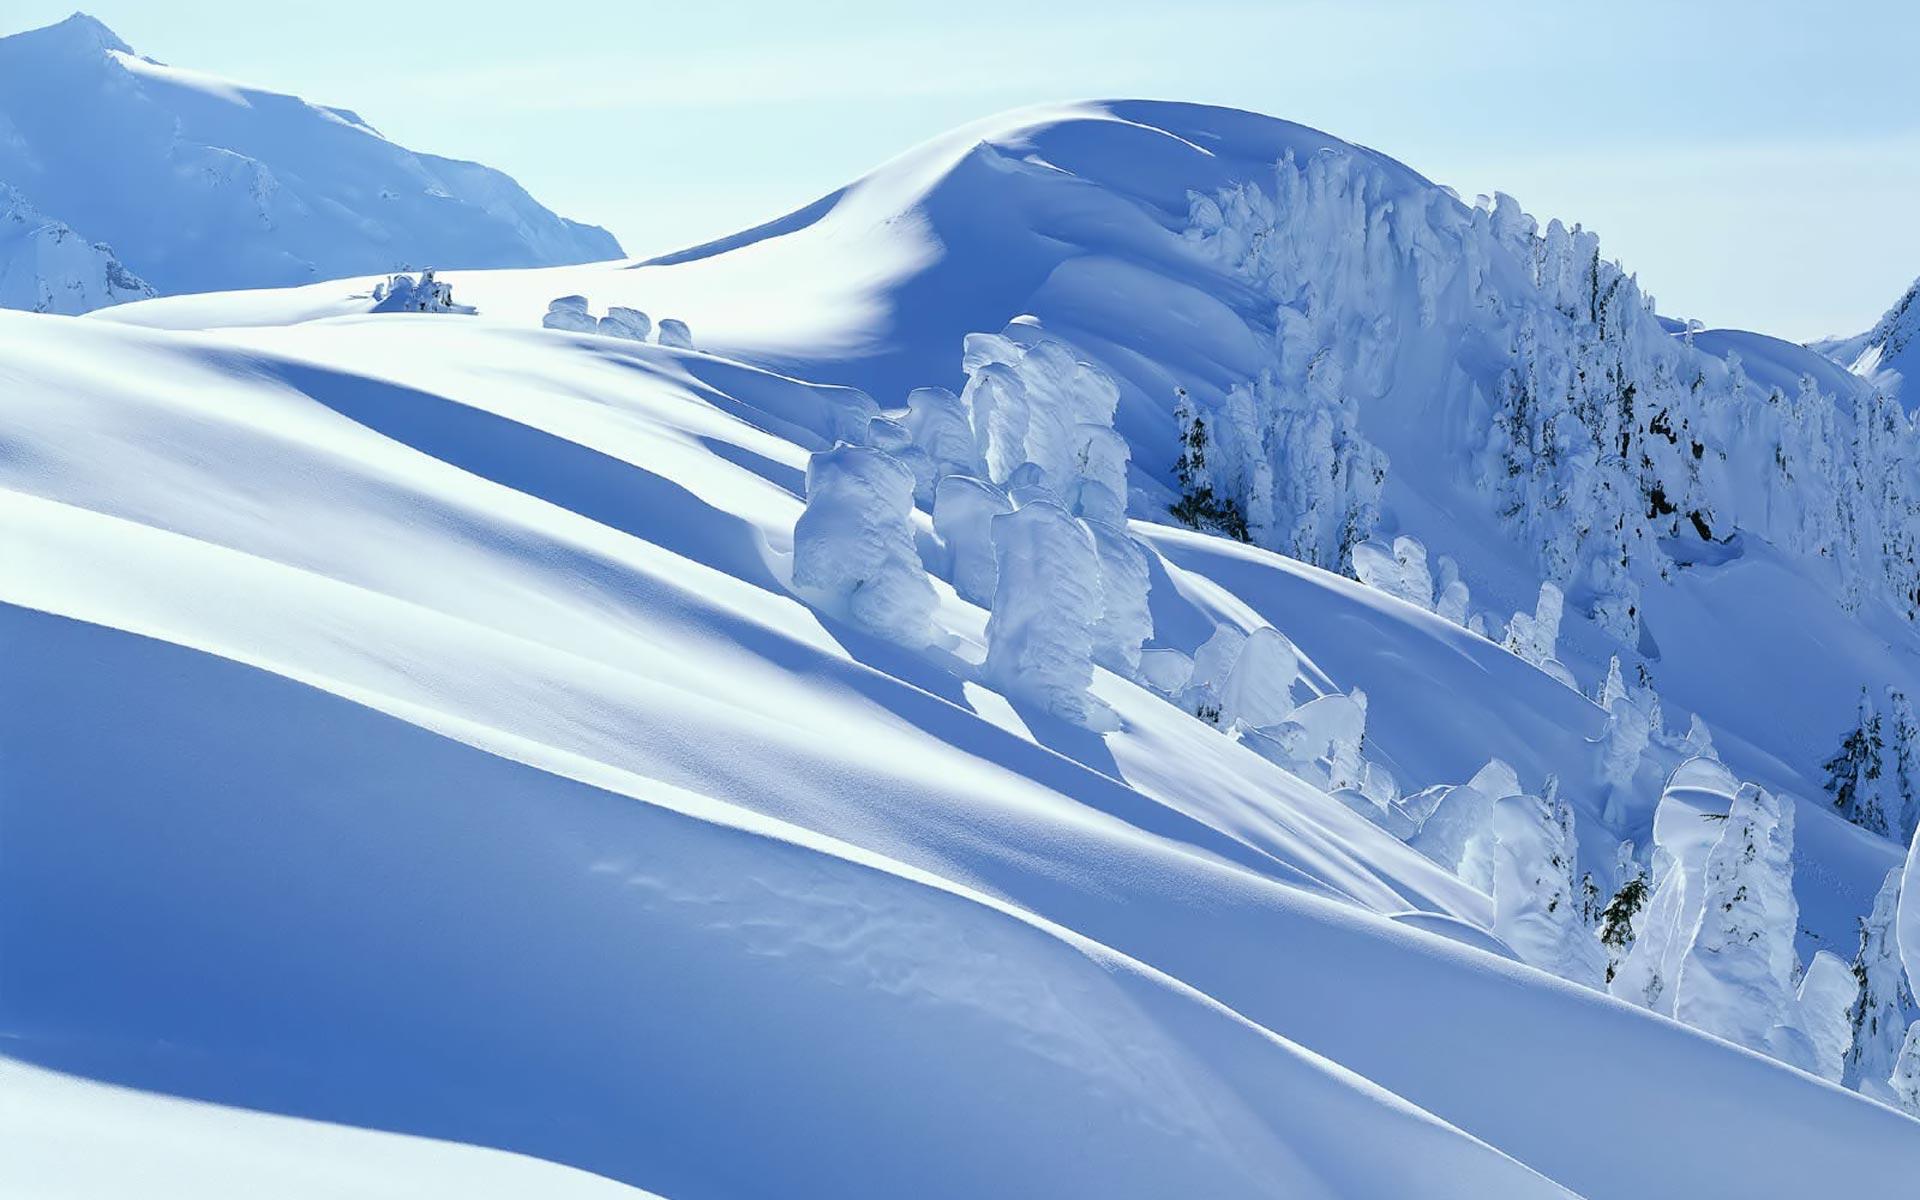 snowy mountains wallpaper